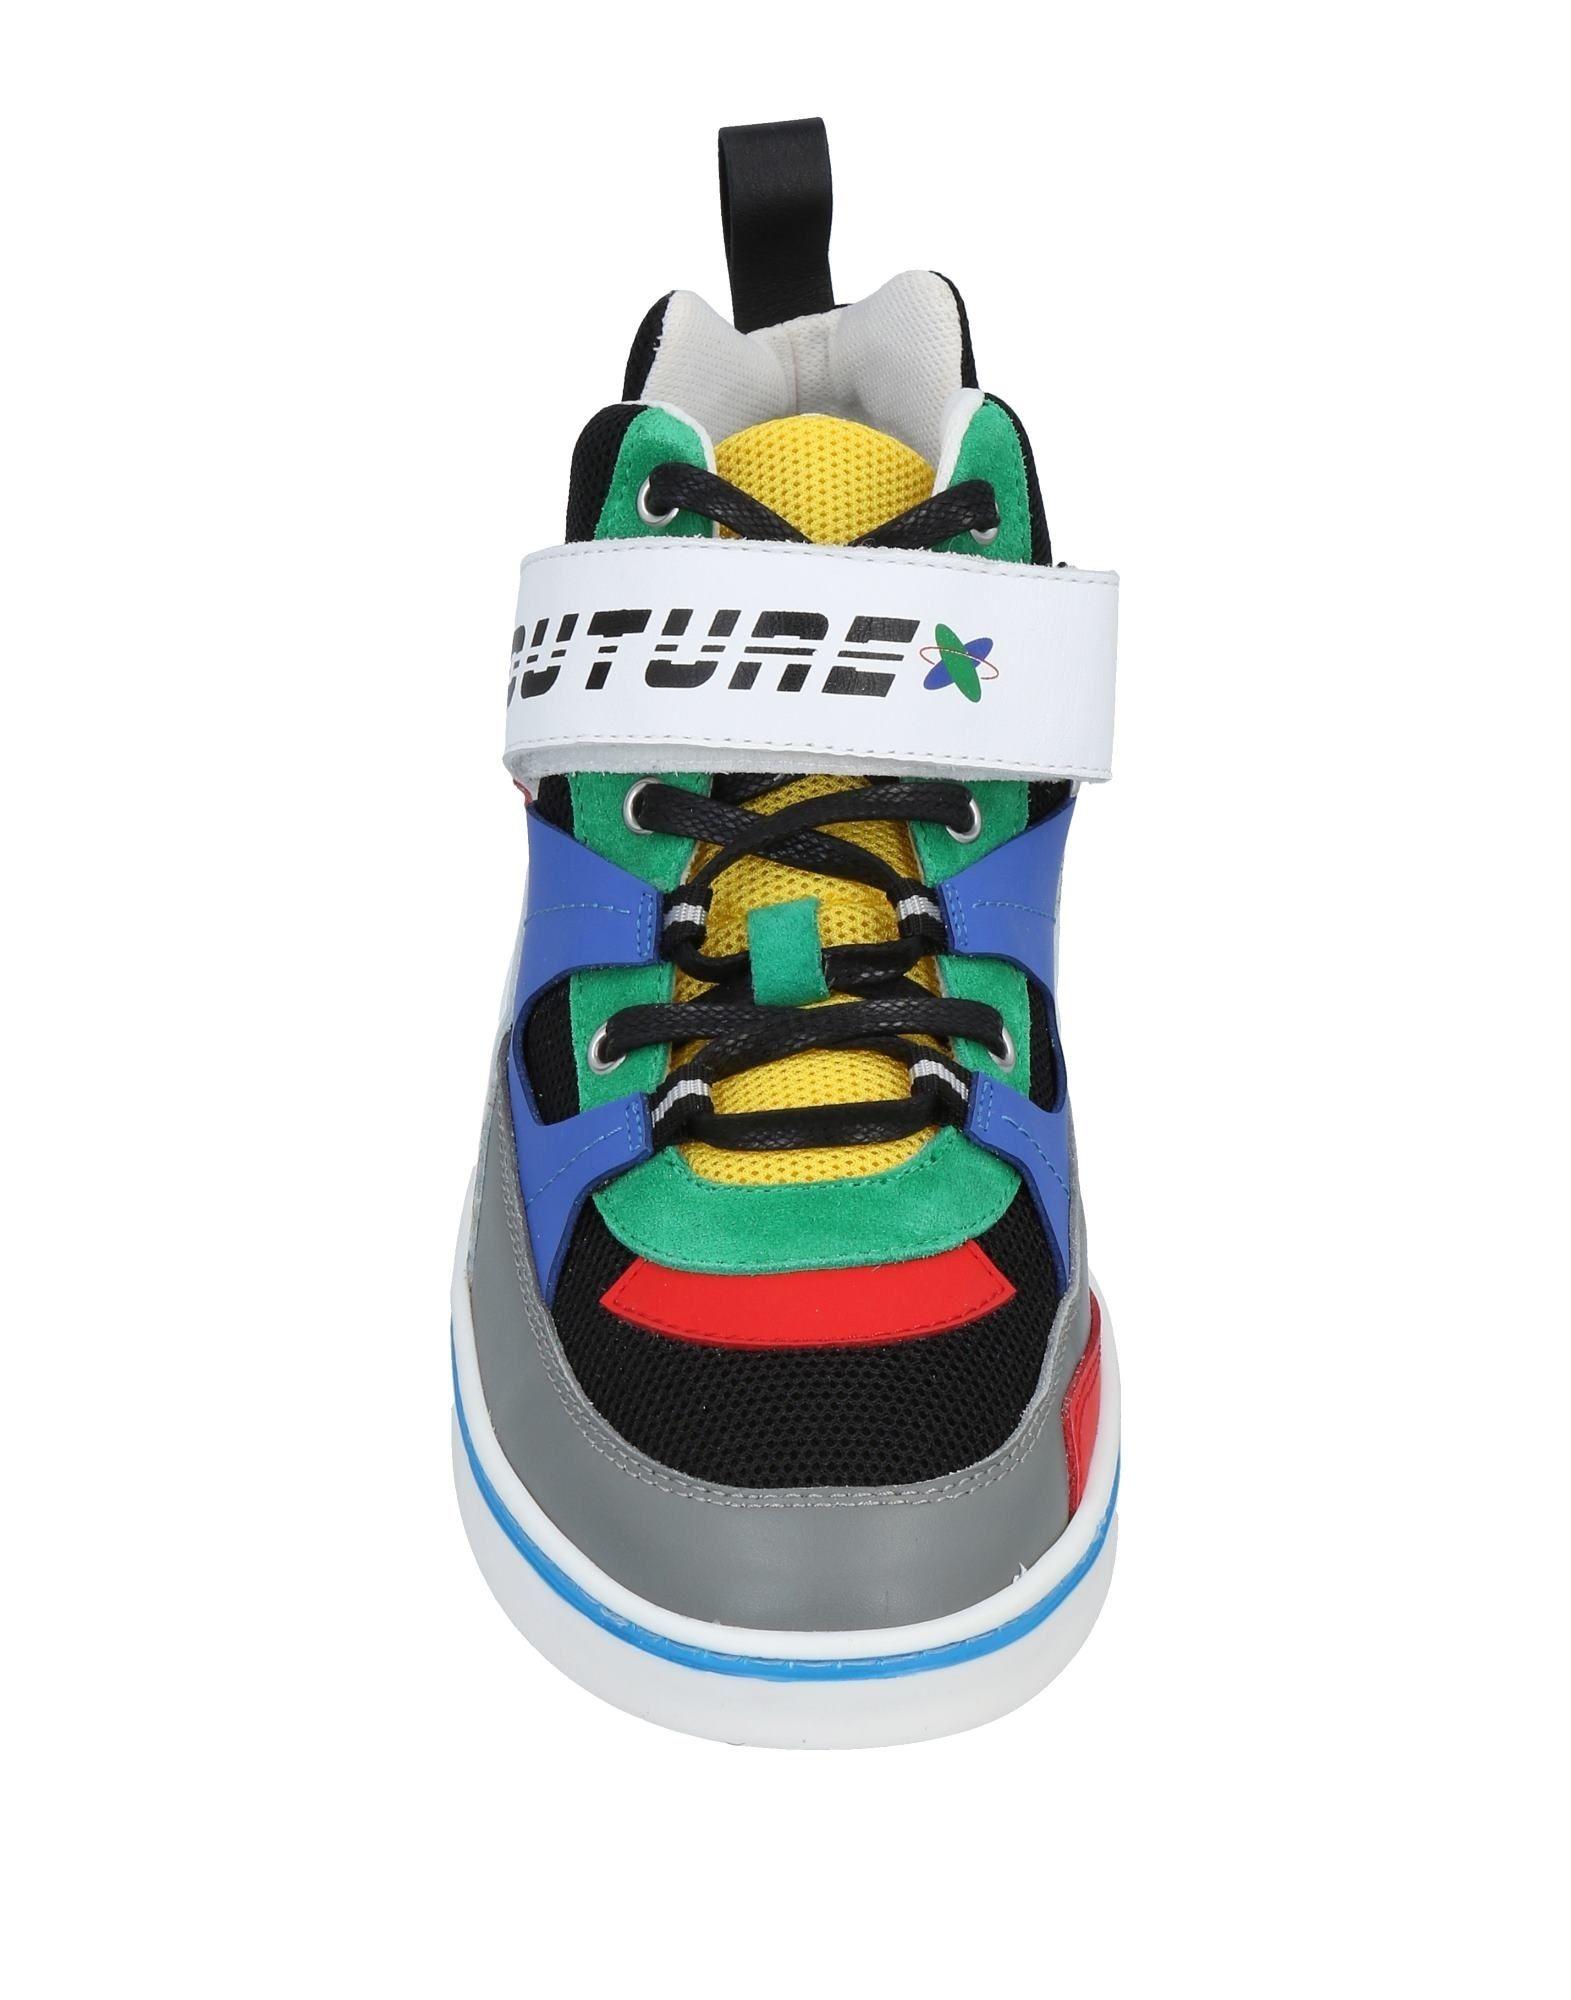 Moschino Sneakers Schuhe Herren  11492355VQ Heiße Schuhe Sneakers a646e5